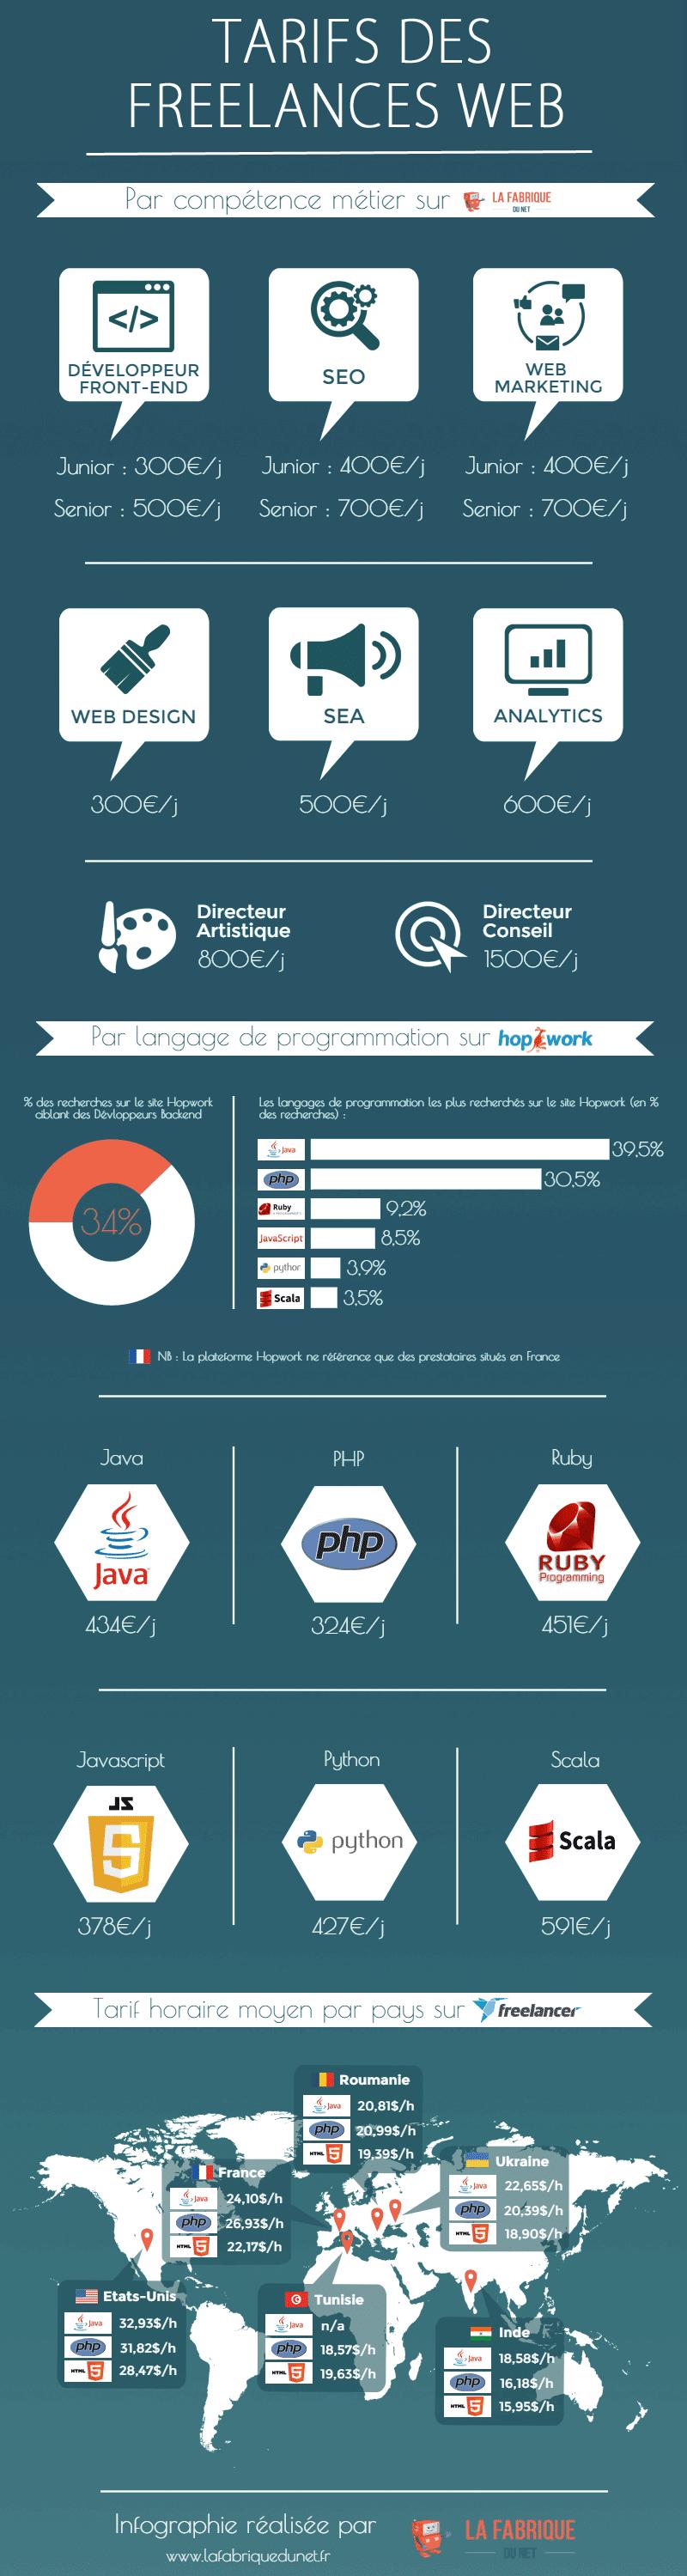 infographie tarifs freelances